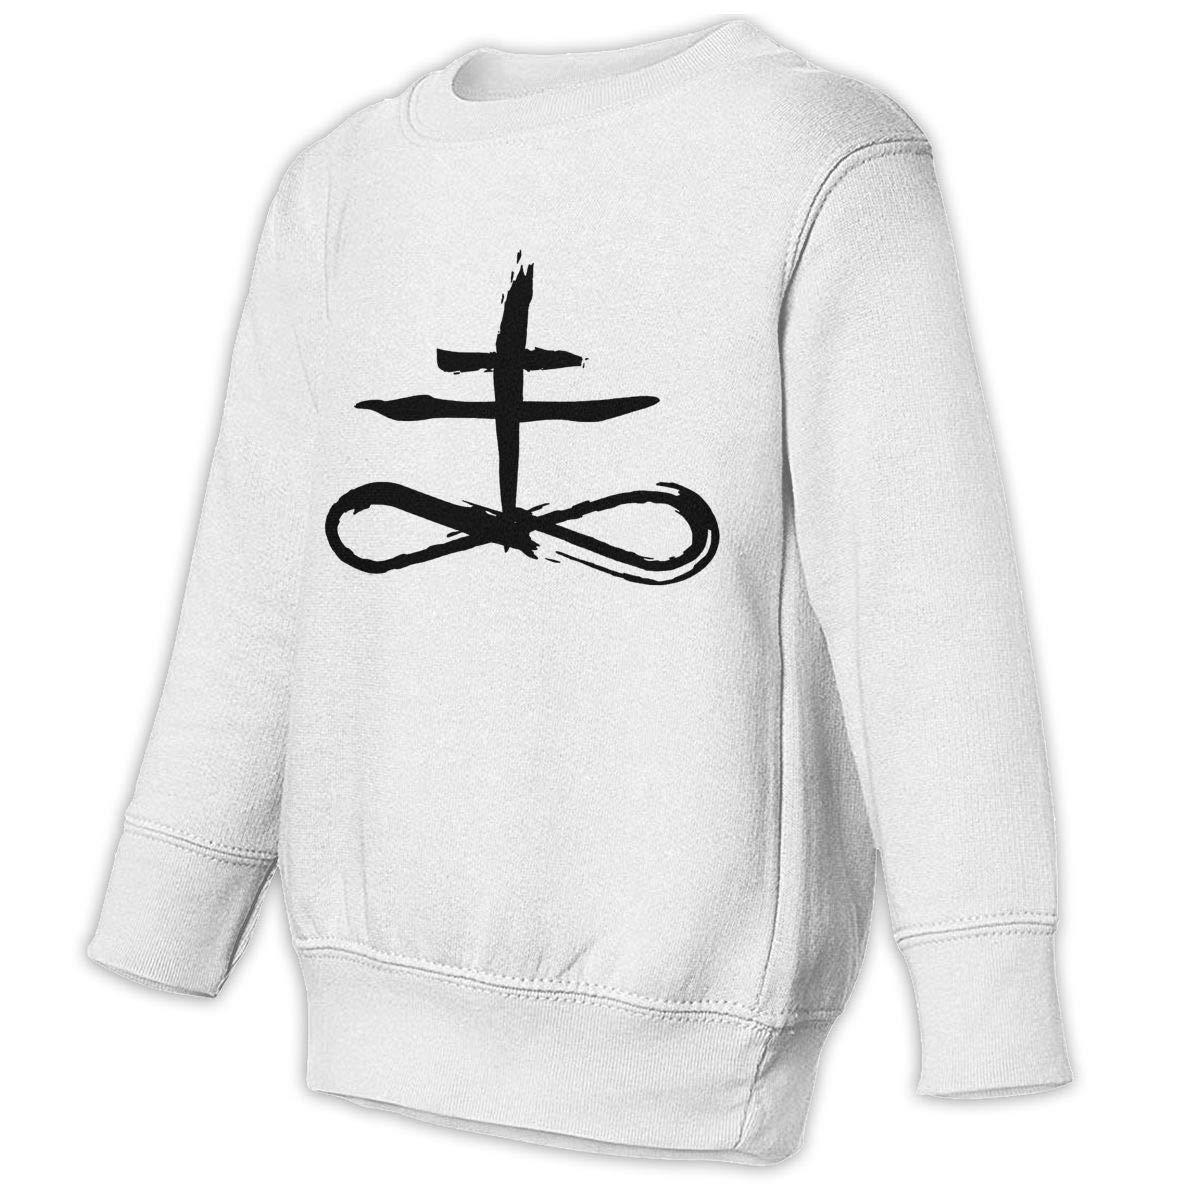 GHYNJUM Alchemy Sulfur Symbol Juvenile Unisex Cotton Long Sleeve Round Neck Sweatshirt